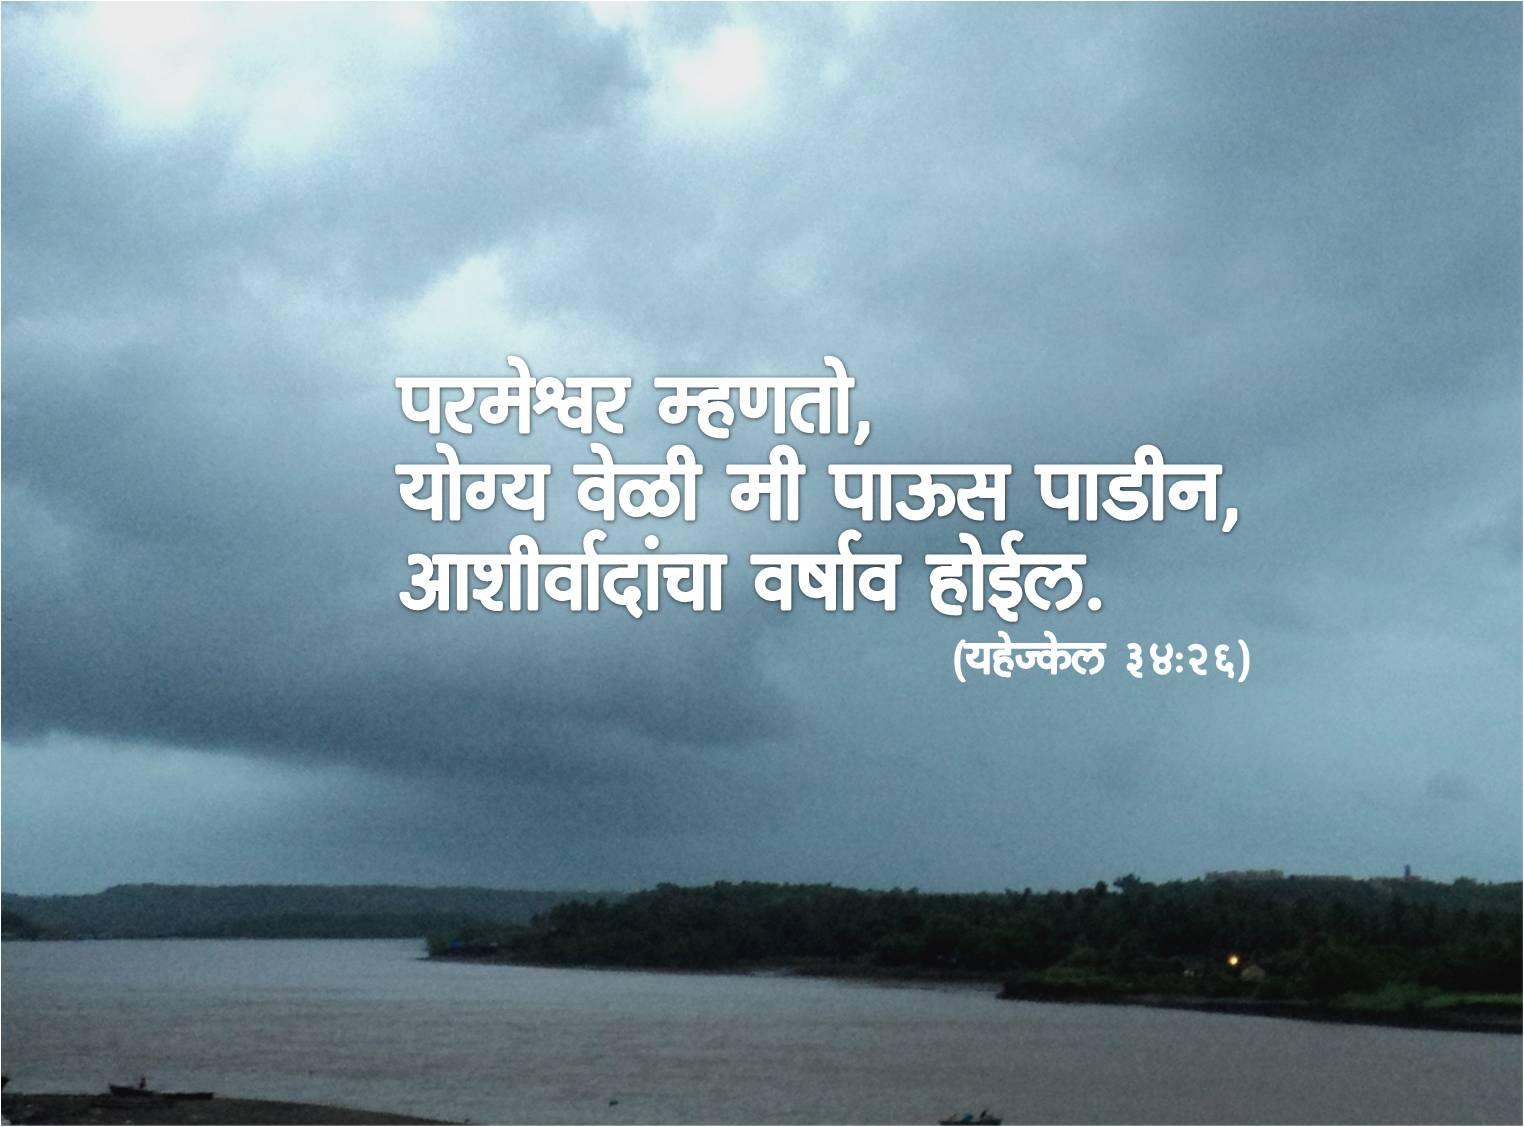 marathi bible wallpaper for - photo #16